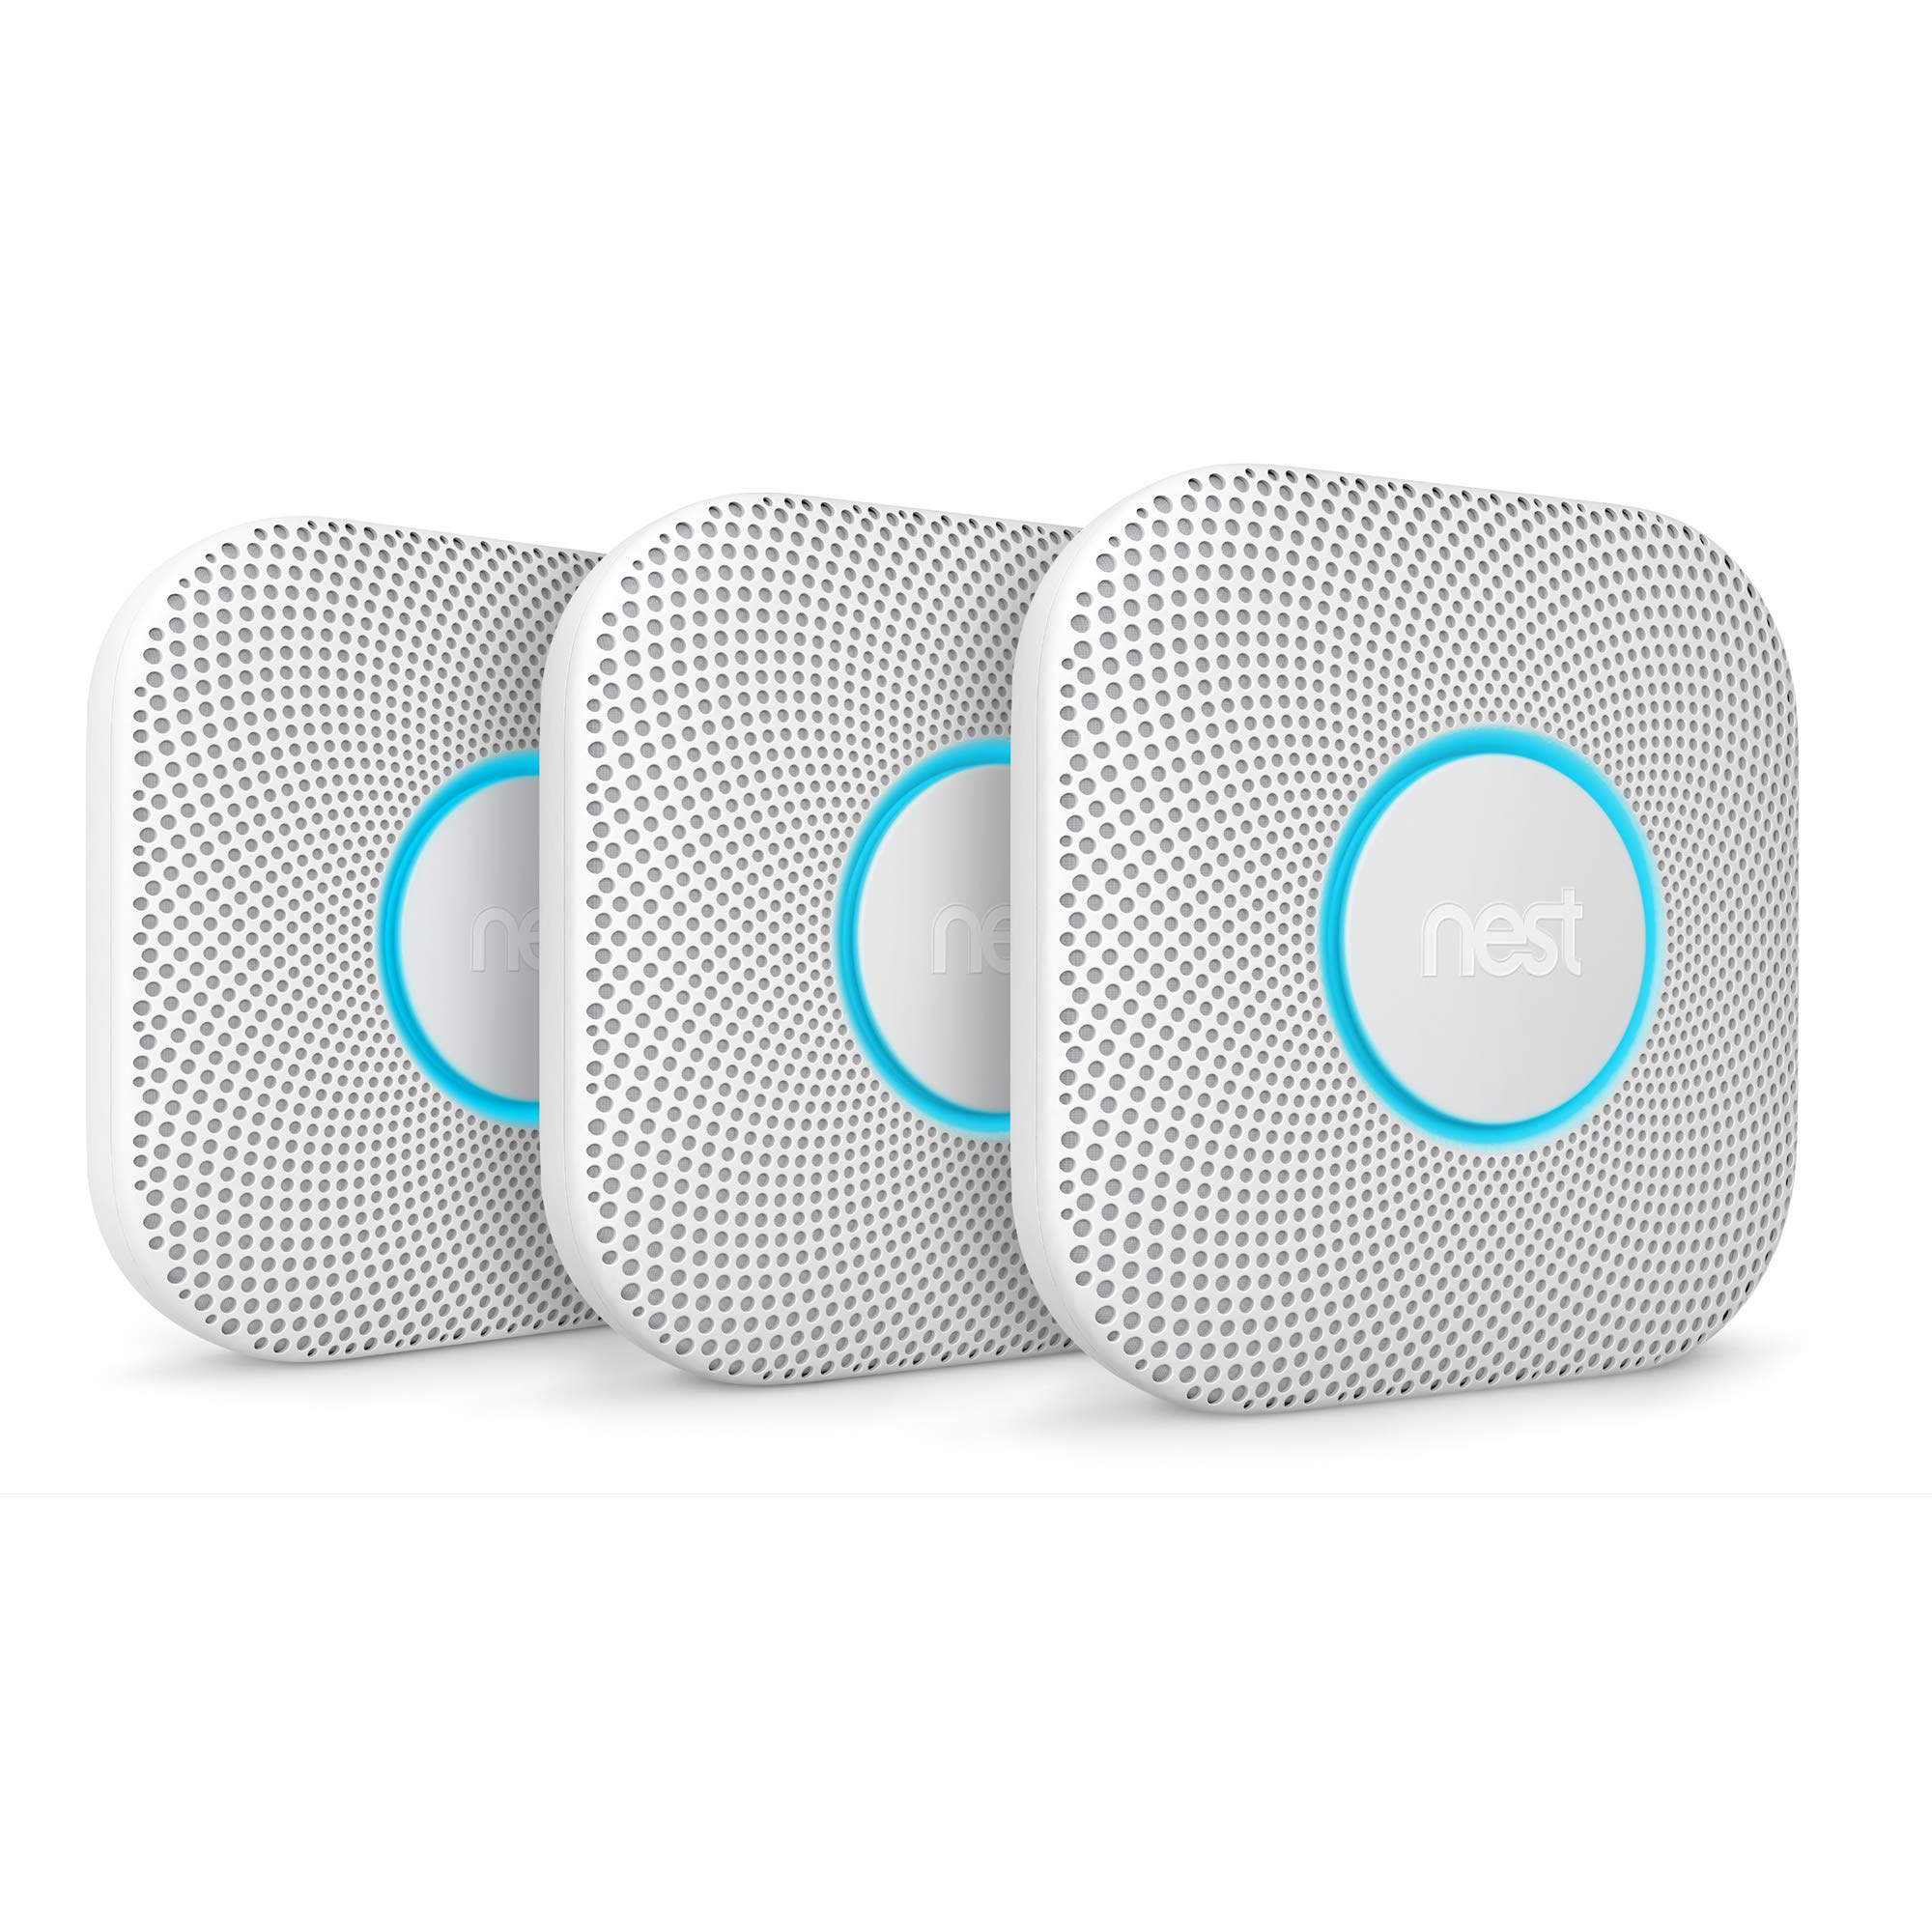 Google S3006WBUS Nest, 3 Pack, Protect, Smoke & Carbon Monoxide Alarm, 2nd Generation, 3-pack, Battery, 3, White, 3 Piece